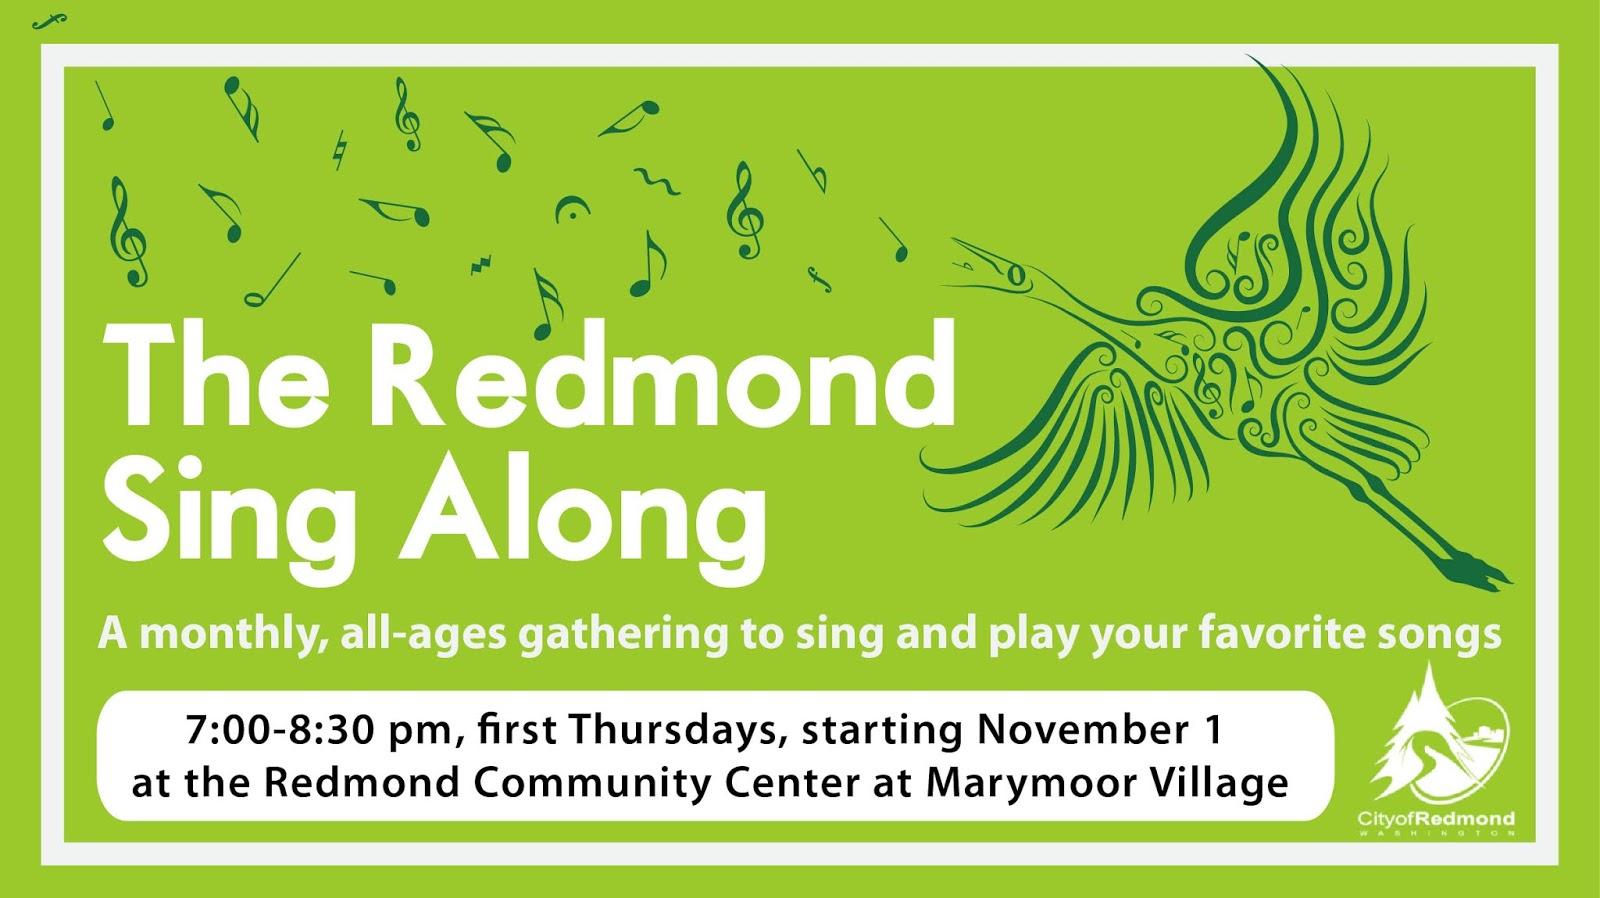 Redmond Neighborhood Blog: Redmond Sing Along at Community